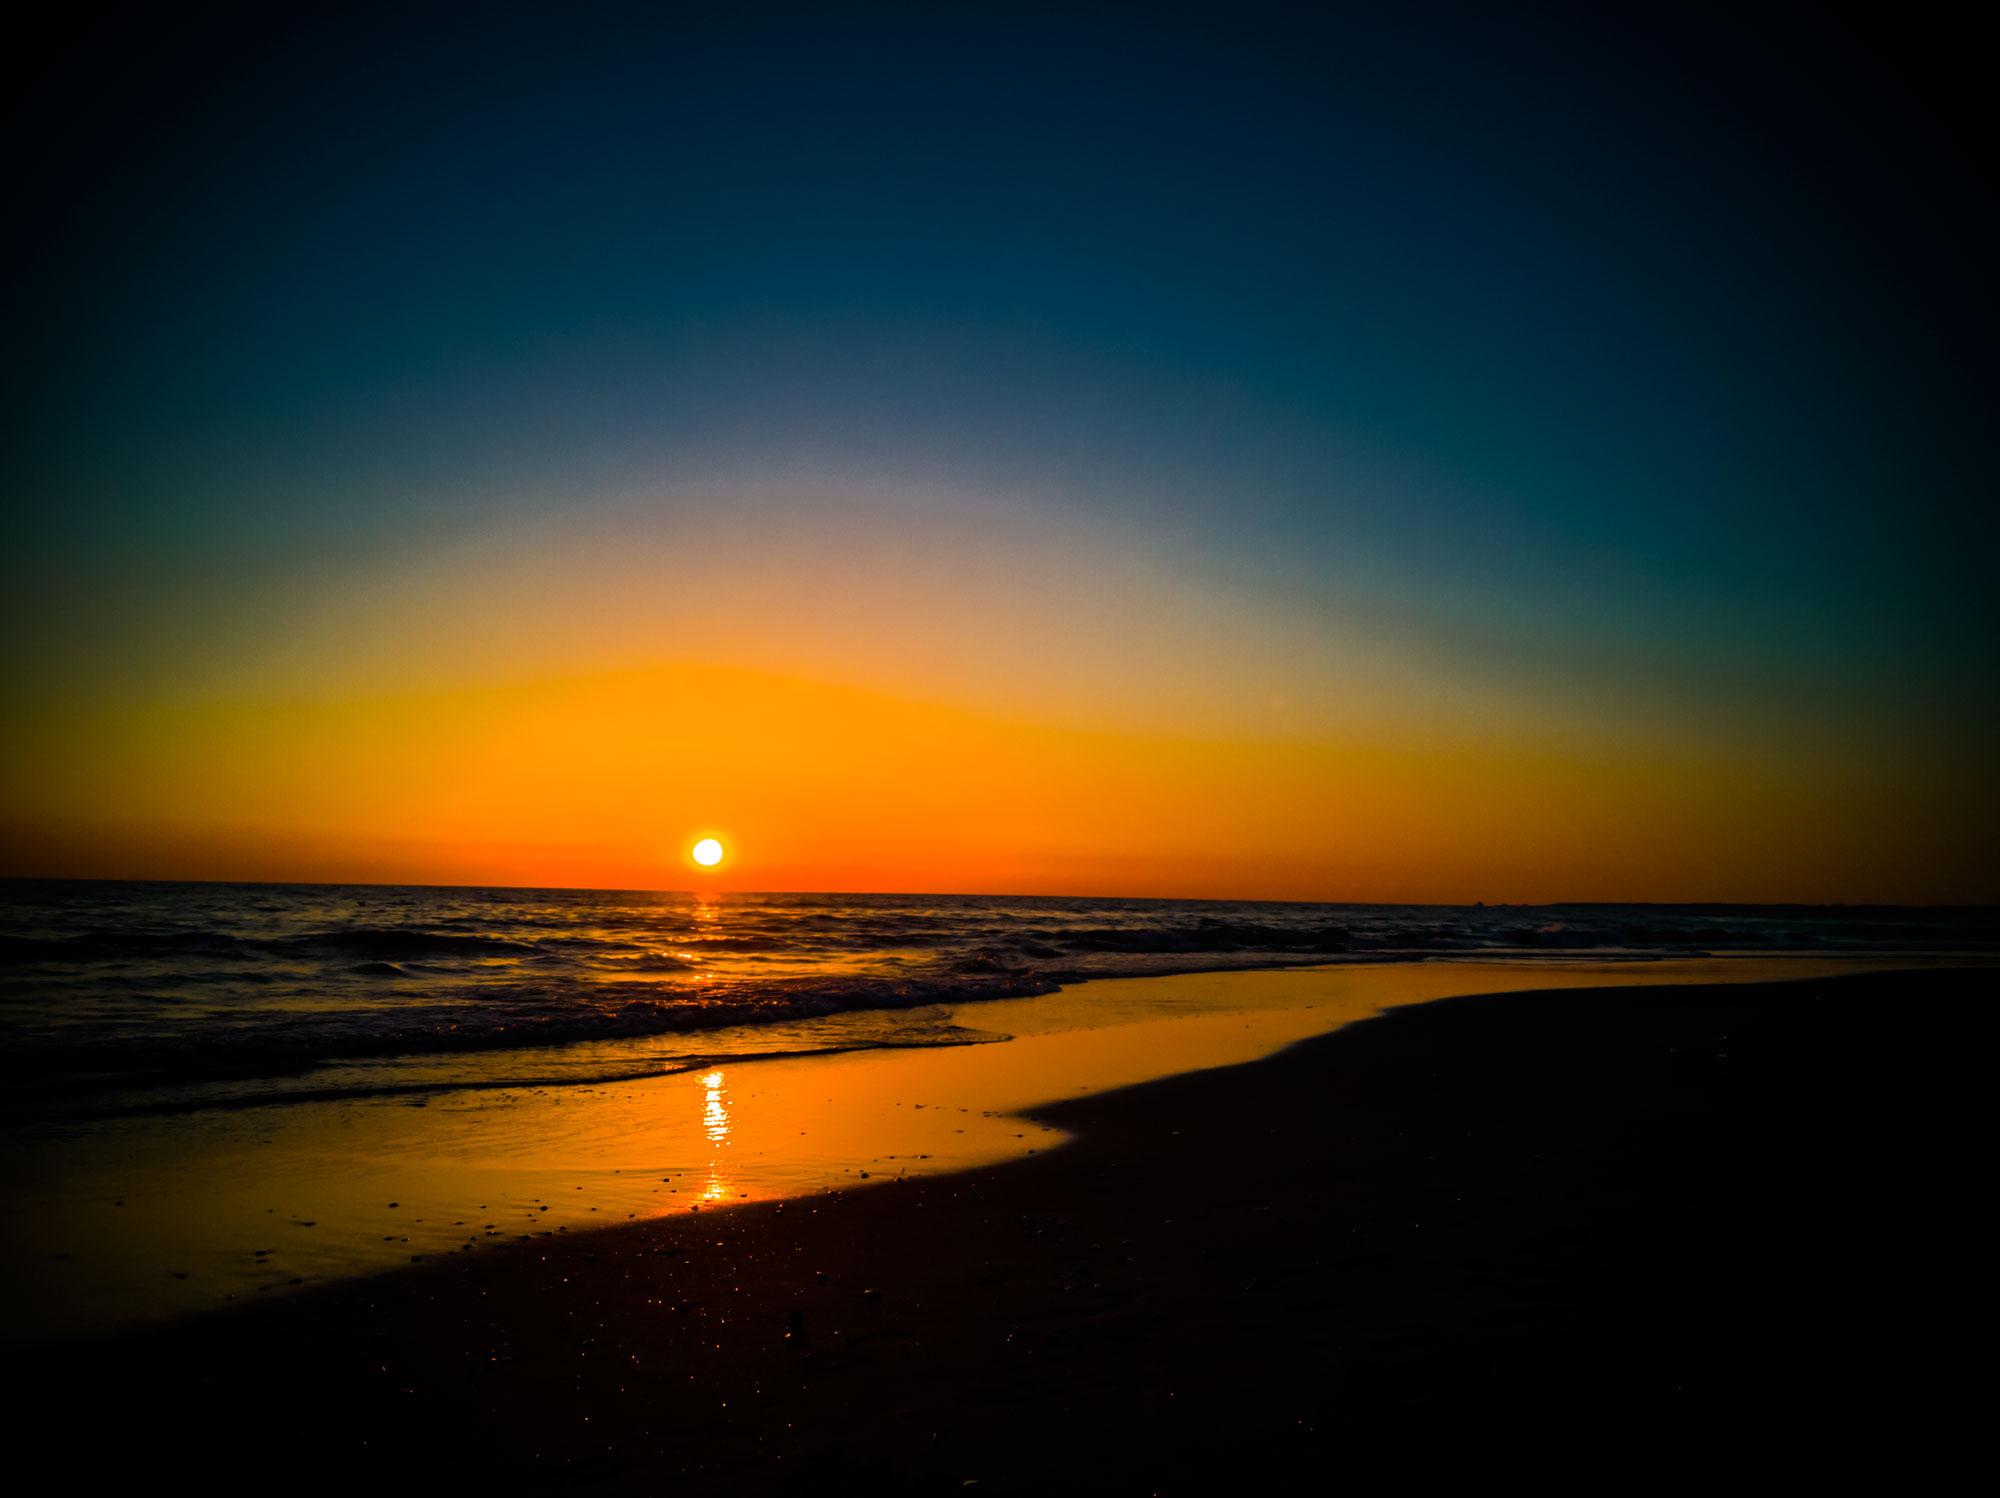 Tramonto Lido di Latina foto al tramonto immagini di tramonto foto di tramonti sul mare mare al tramonto tramonti onde del mare al tramonto colori al tramonto